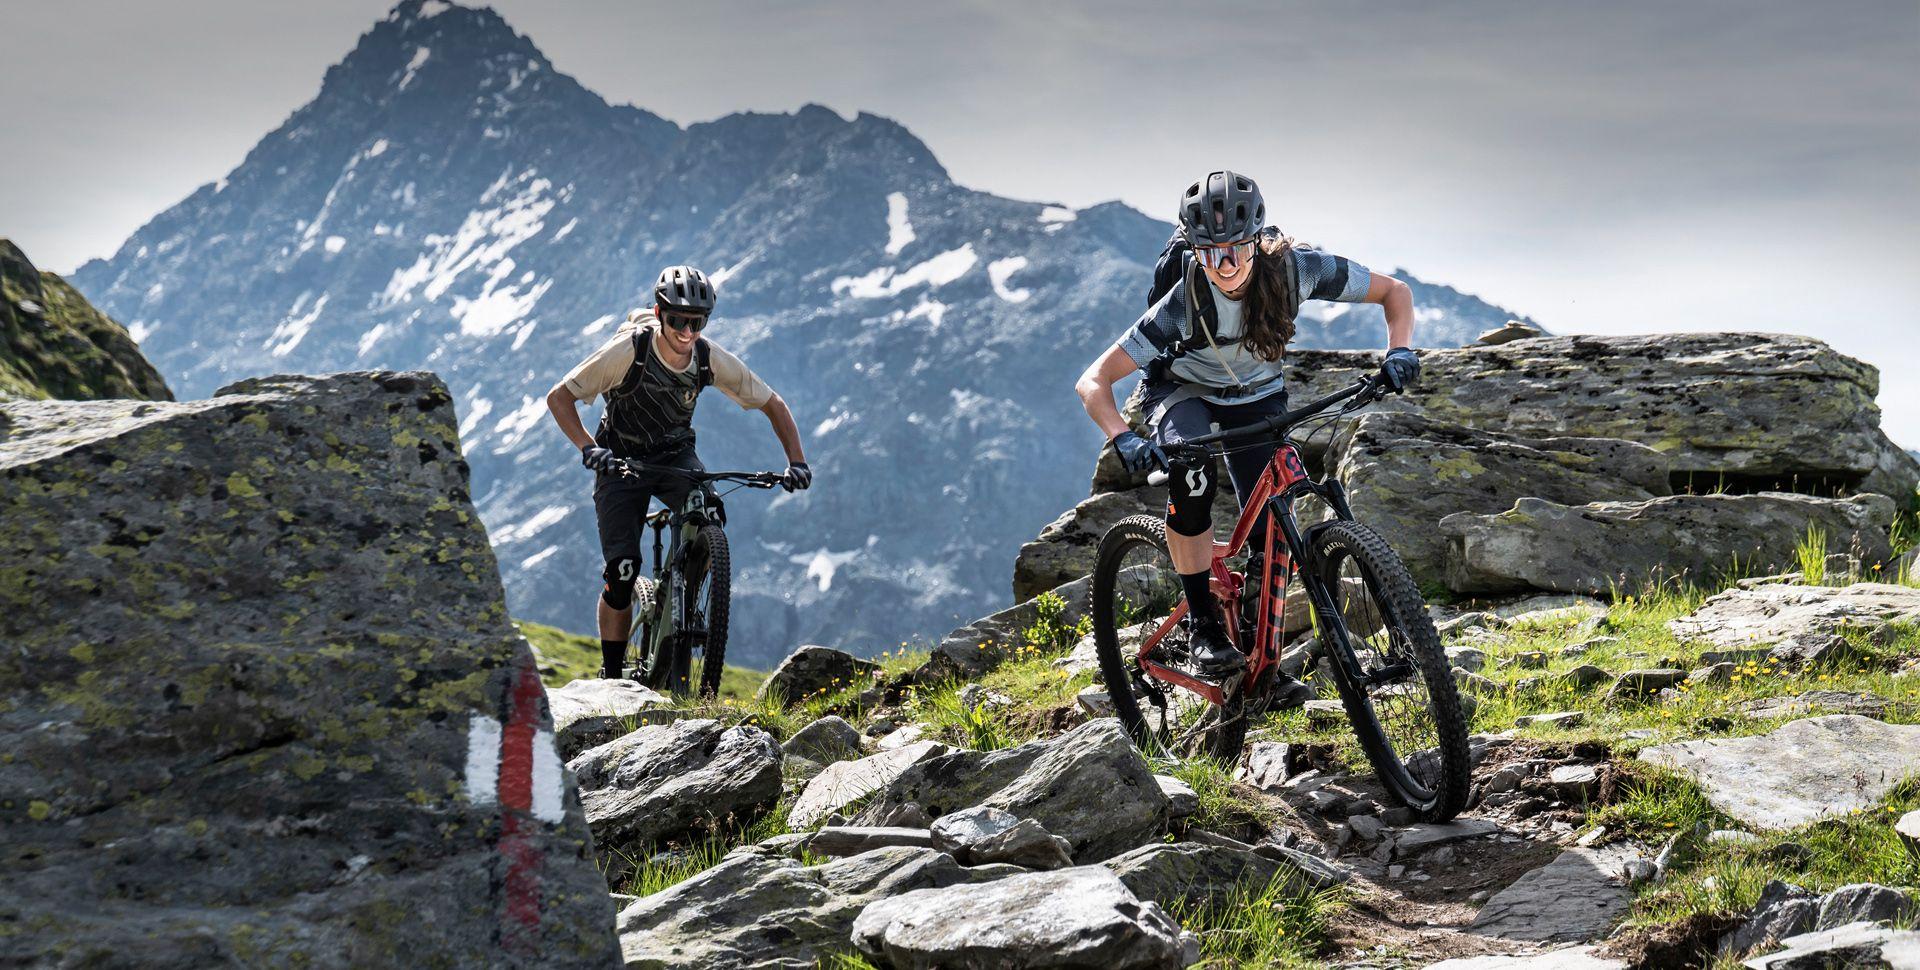 Bike-Bros-Background-Image